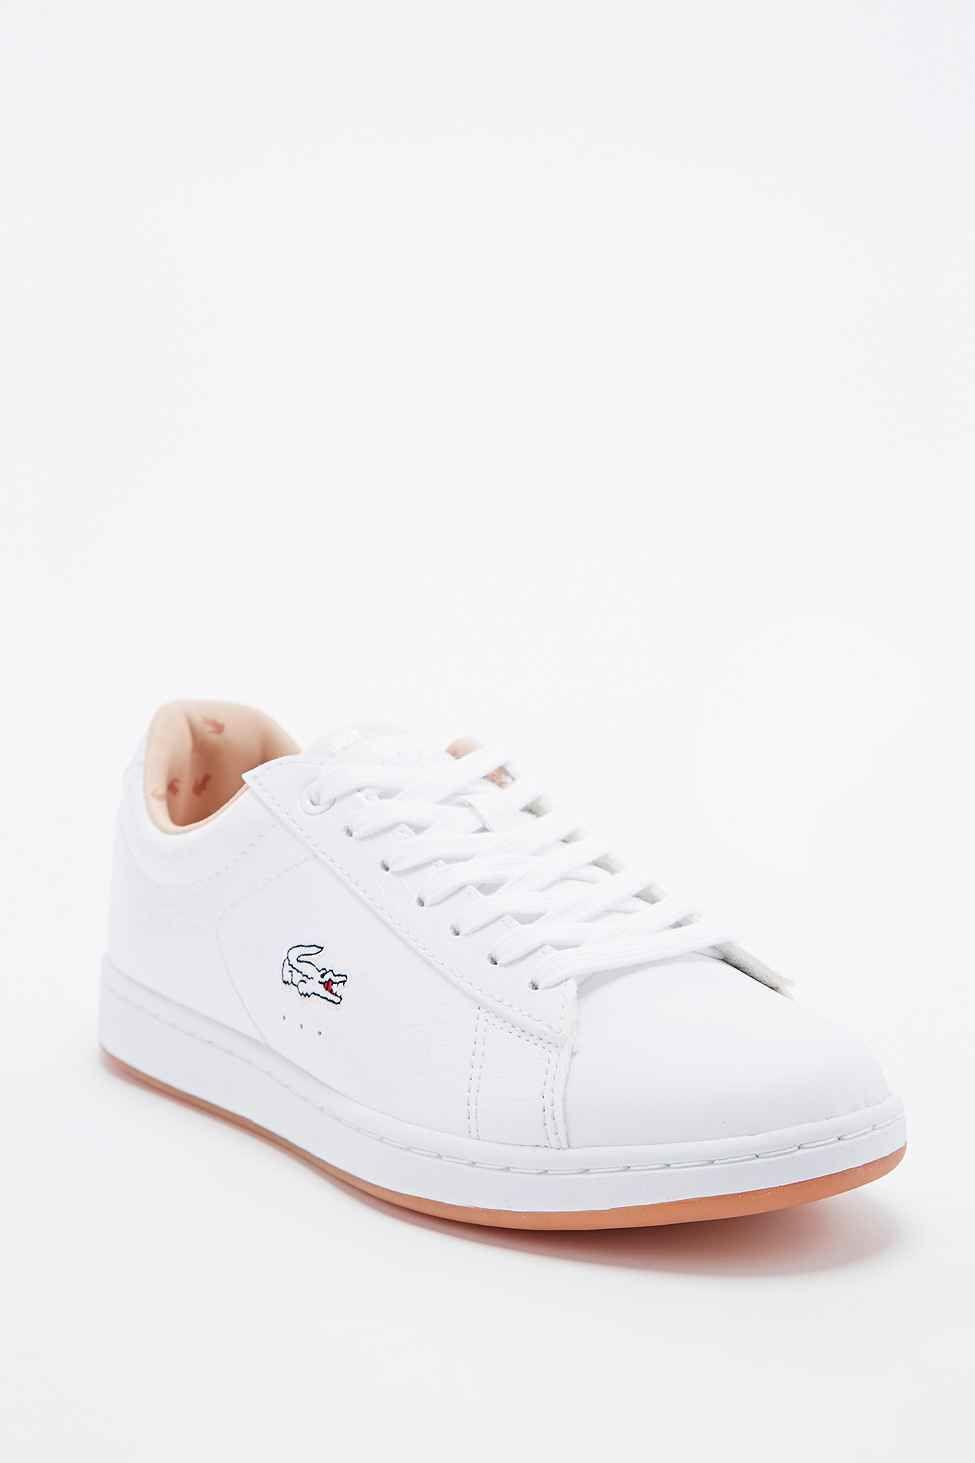 9050c1fa31 Lacoste - Baskets classiques Carnaby Evo avec croco blanc | Shoes ...